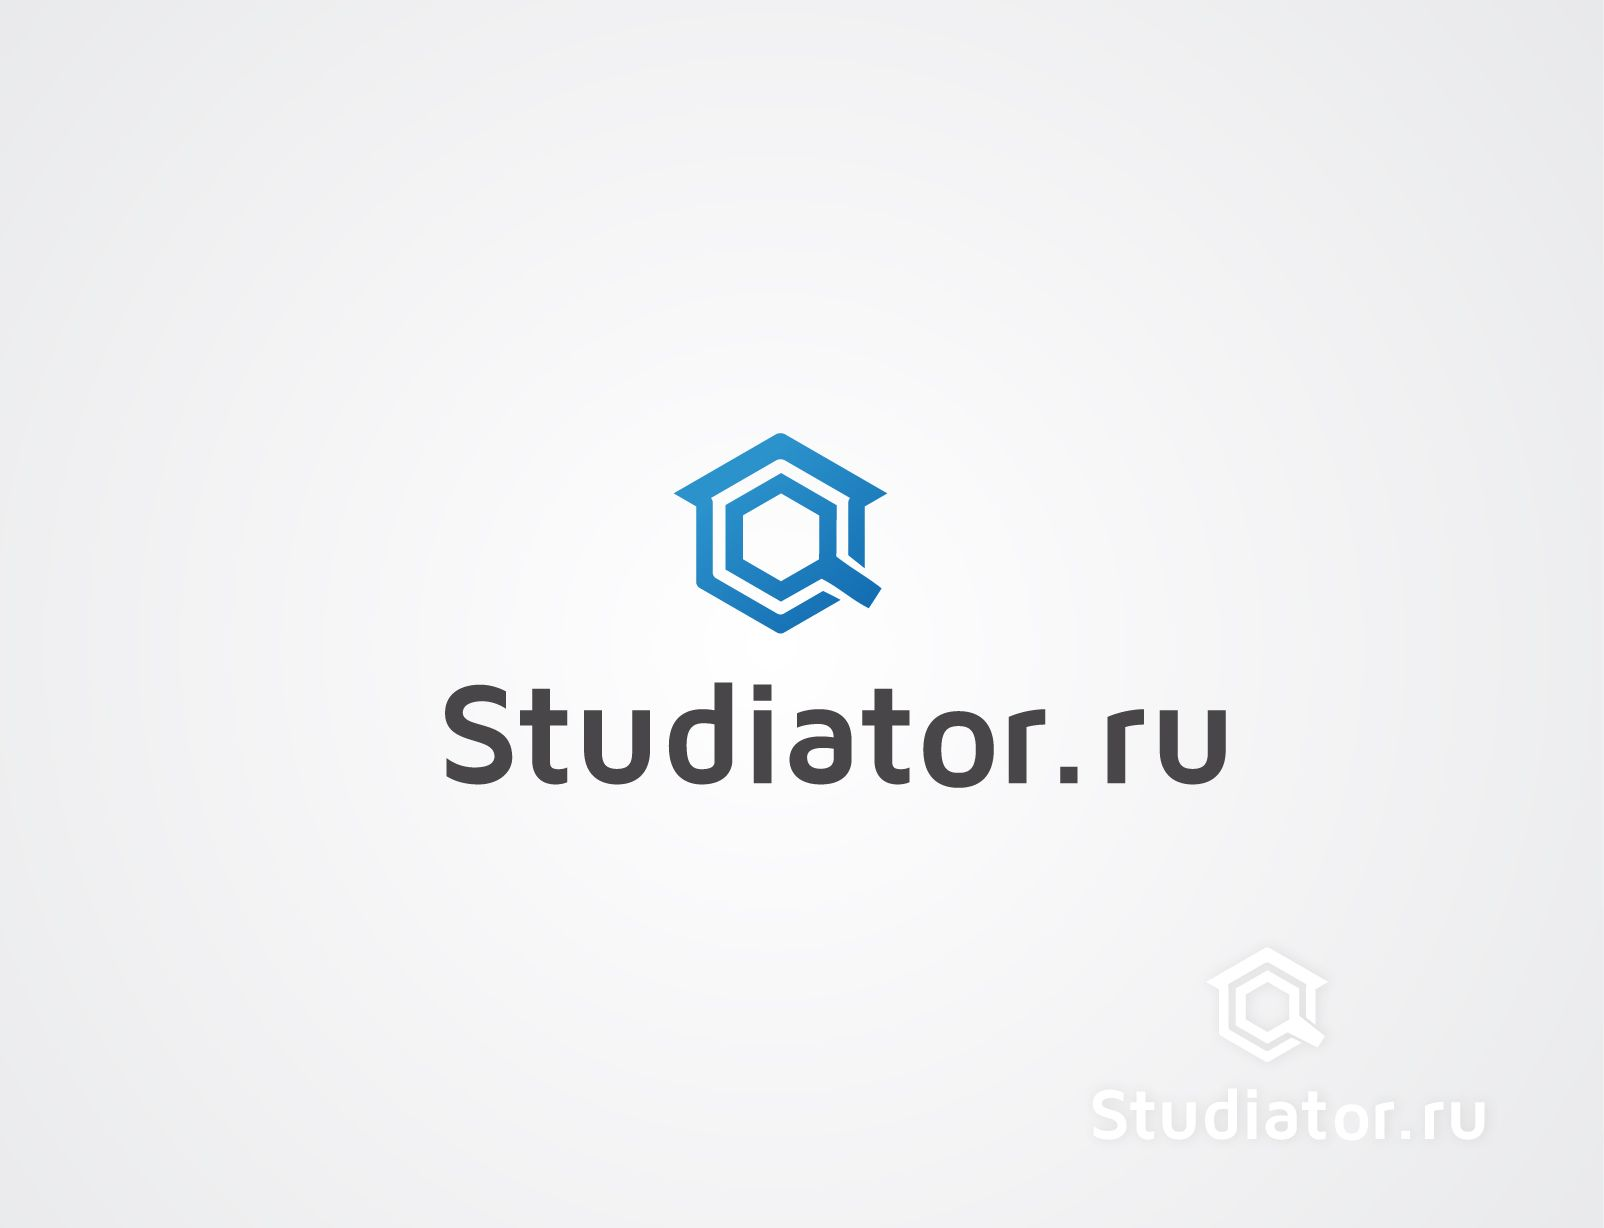 Логотип для каталога студий Веб-дизайна - дизайнер Kov-veronika